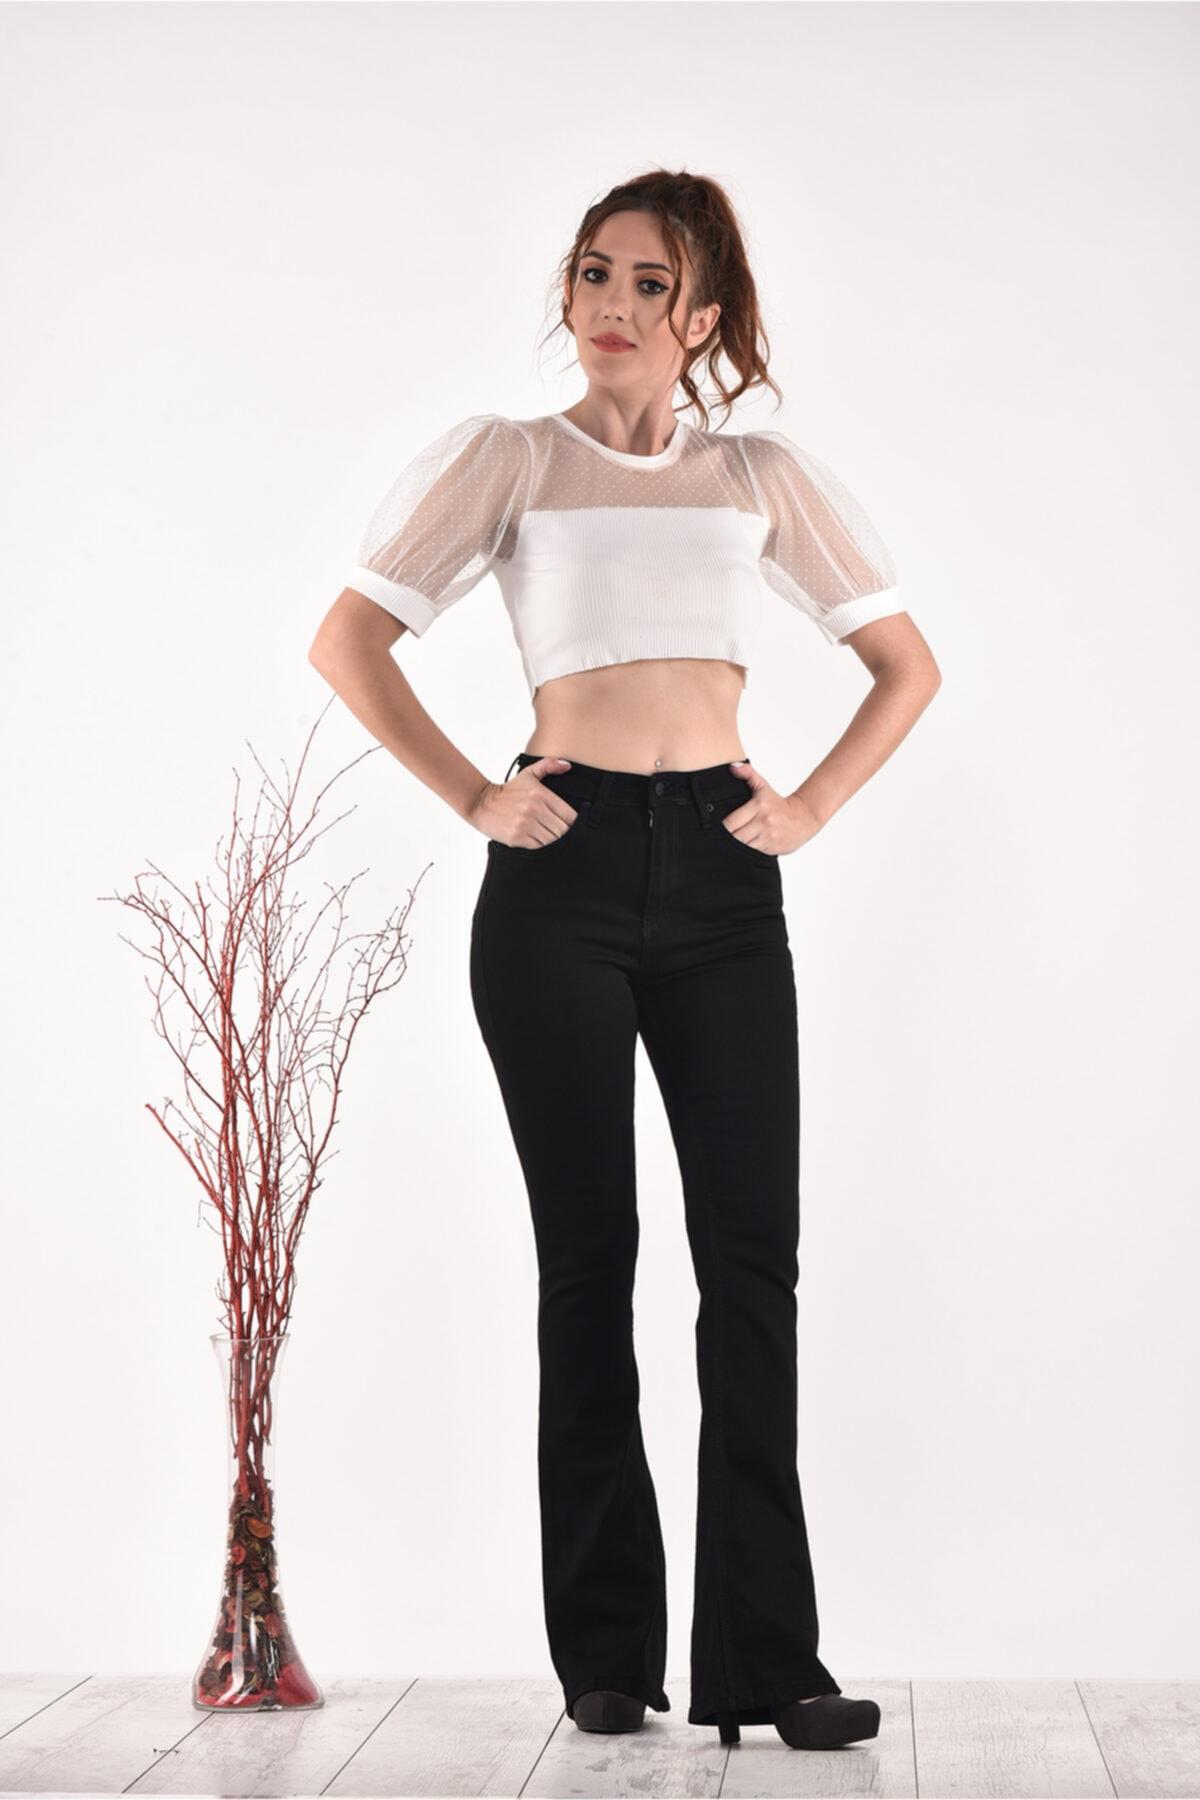 PANTOLOJİ Yüksek Bel Ispanyol Paça 823 Model Black Bayan Jeans Pantolon 1